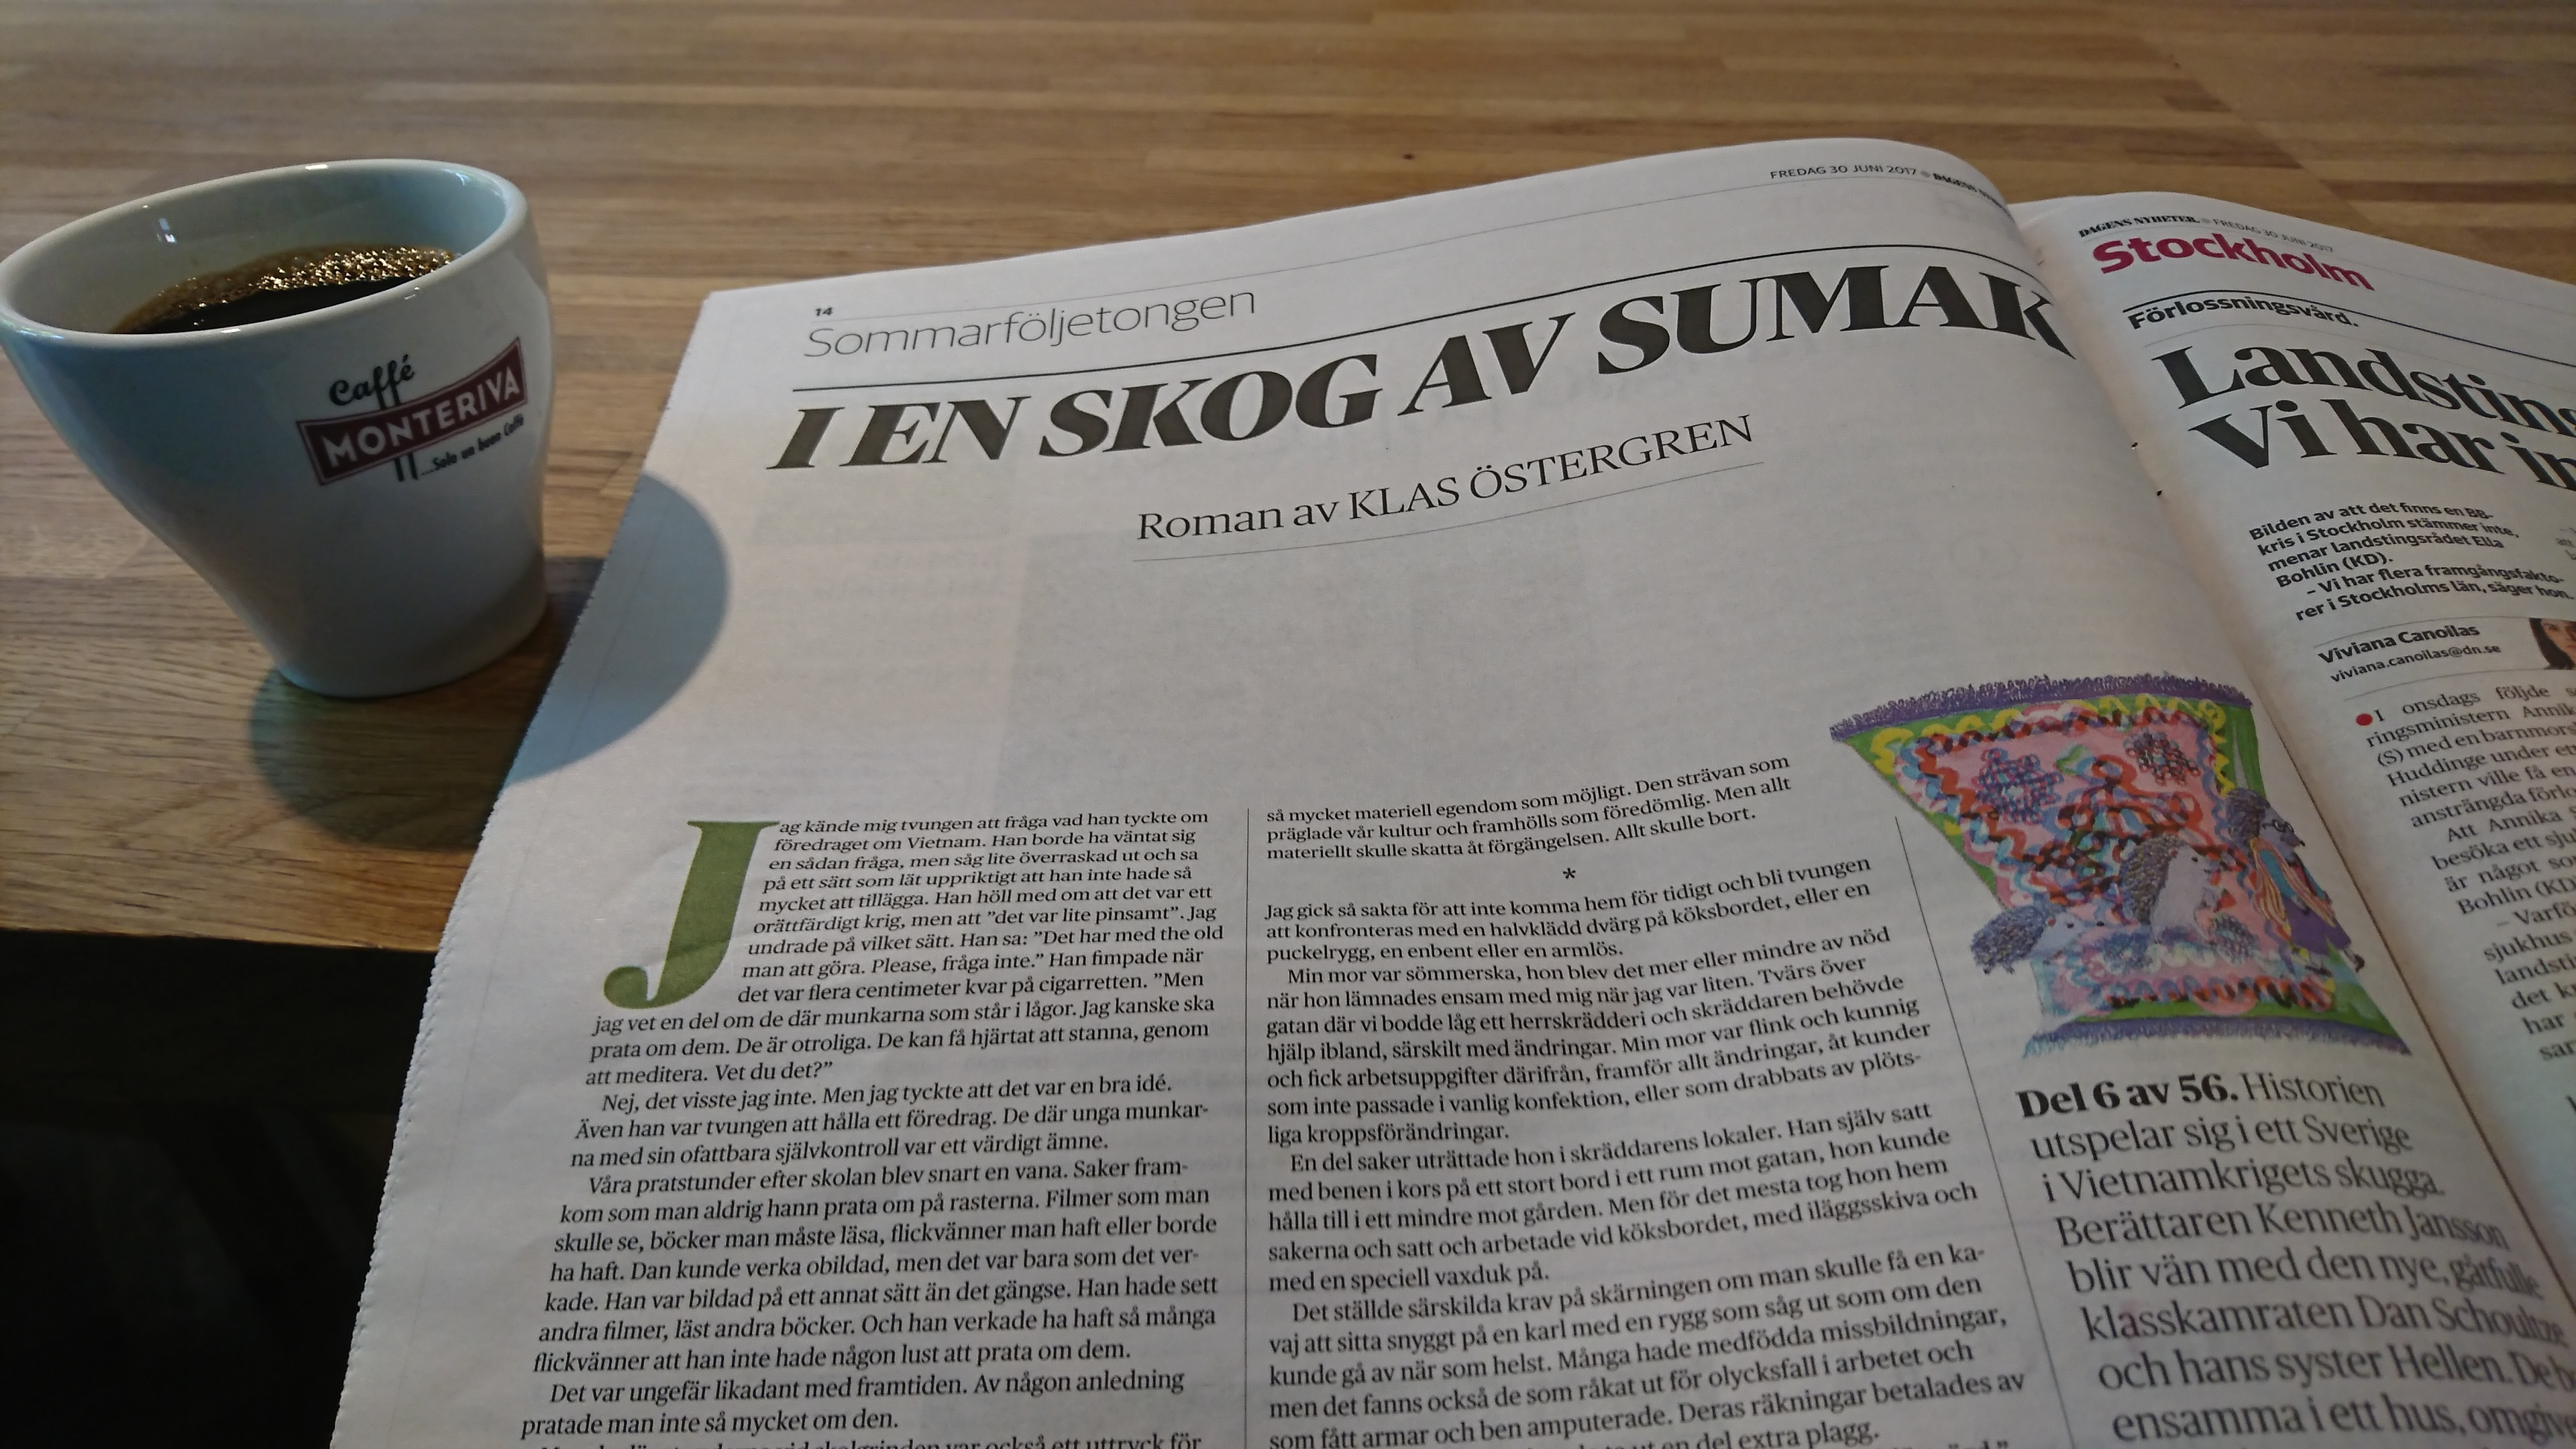 Dns reporter far pris for stockholmsbevakning